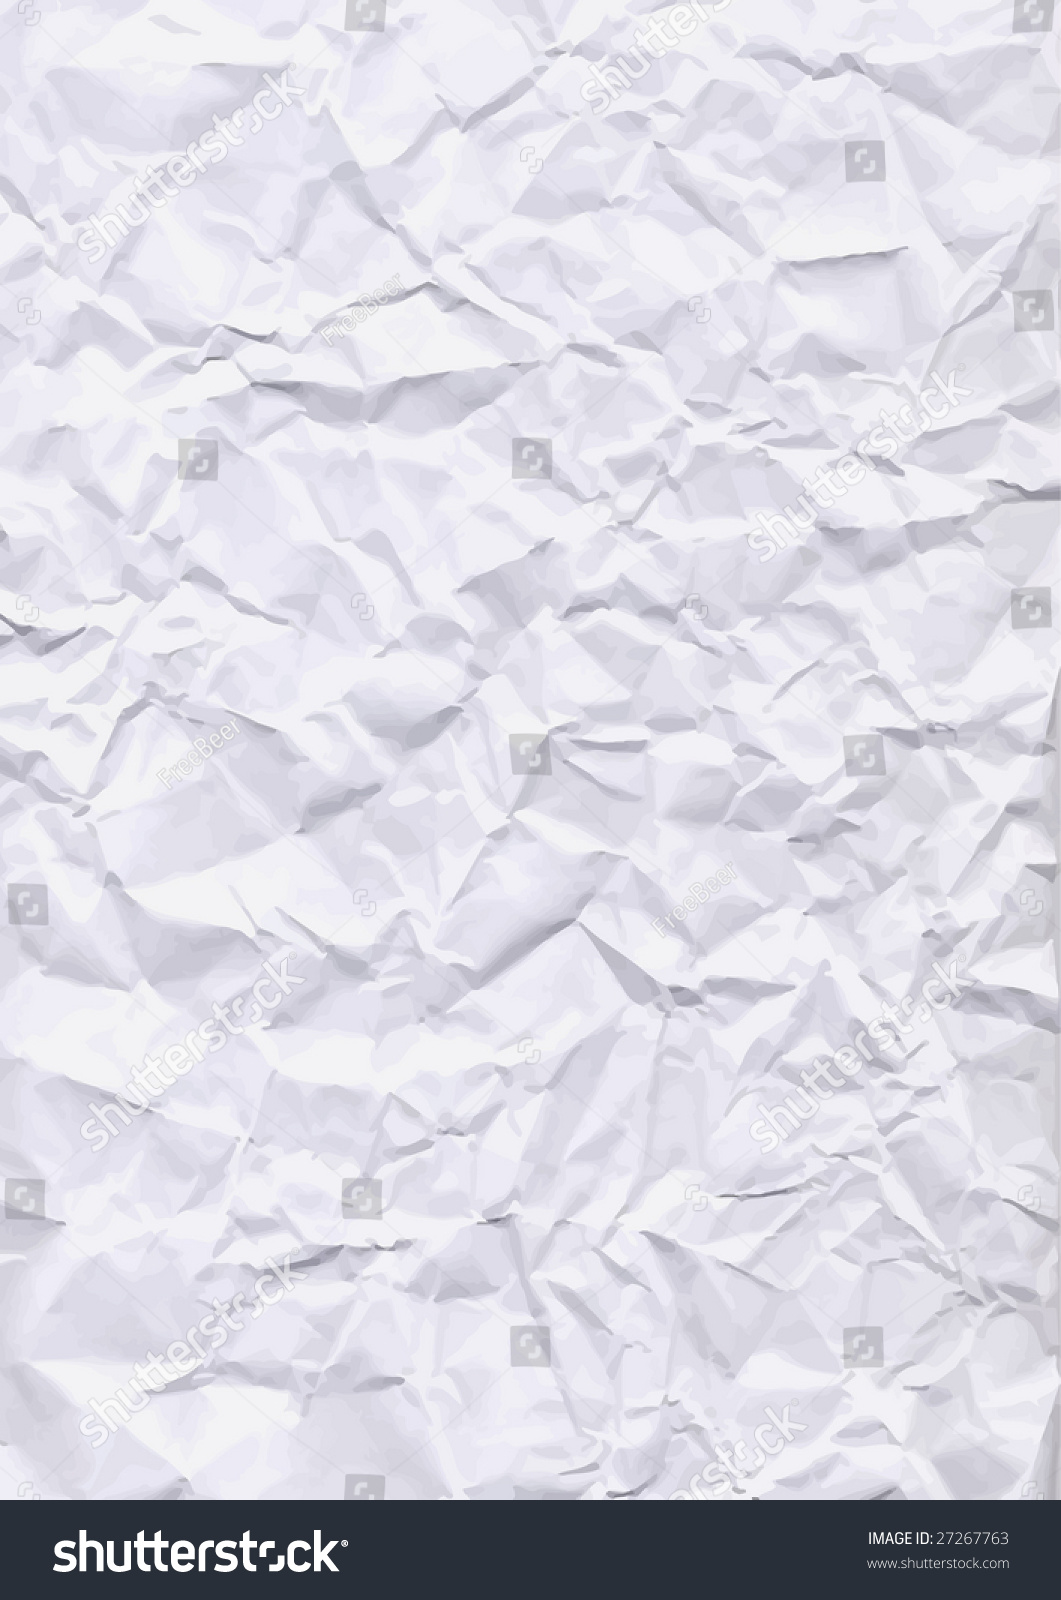 Vector - Crumpled Paper Texture - 27267763 : Shutterstock